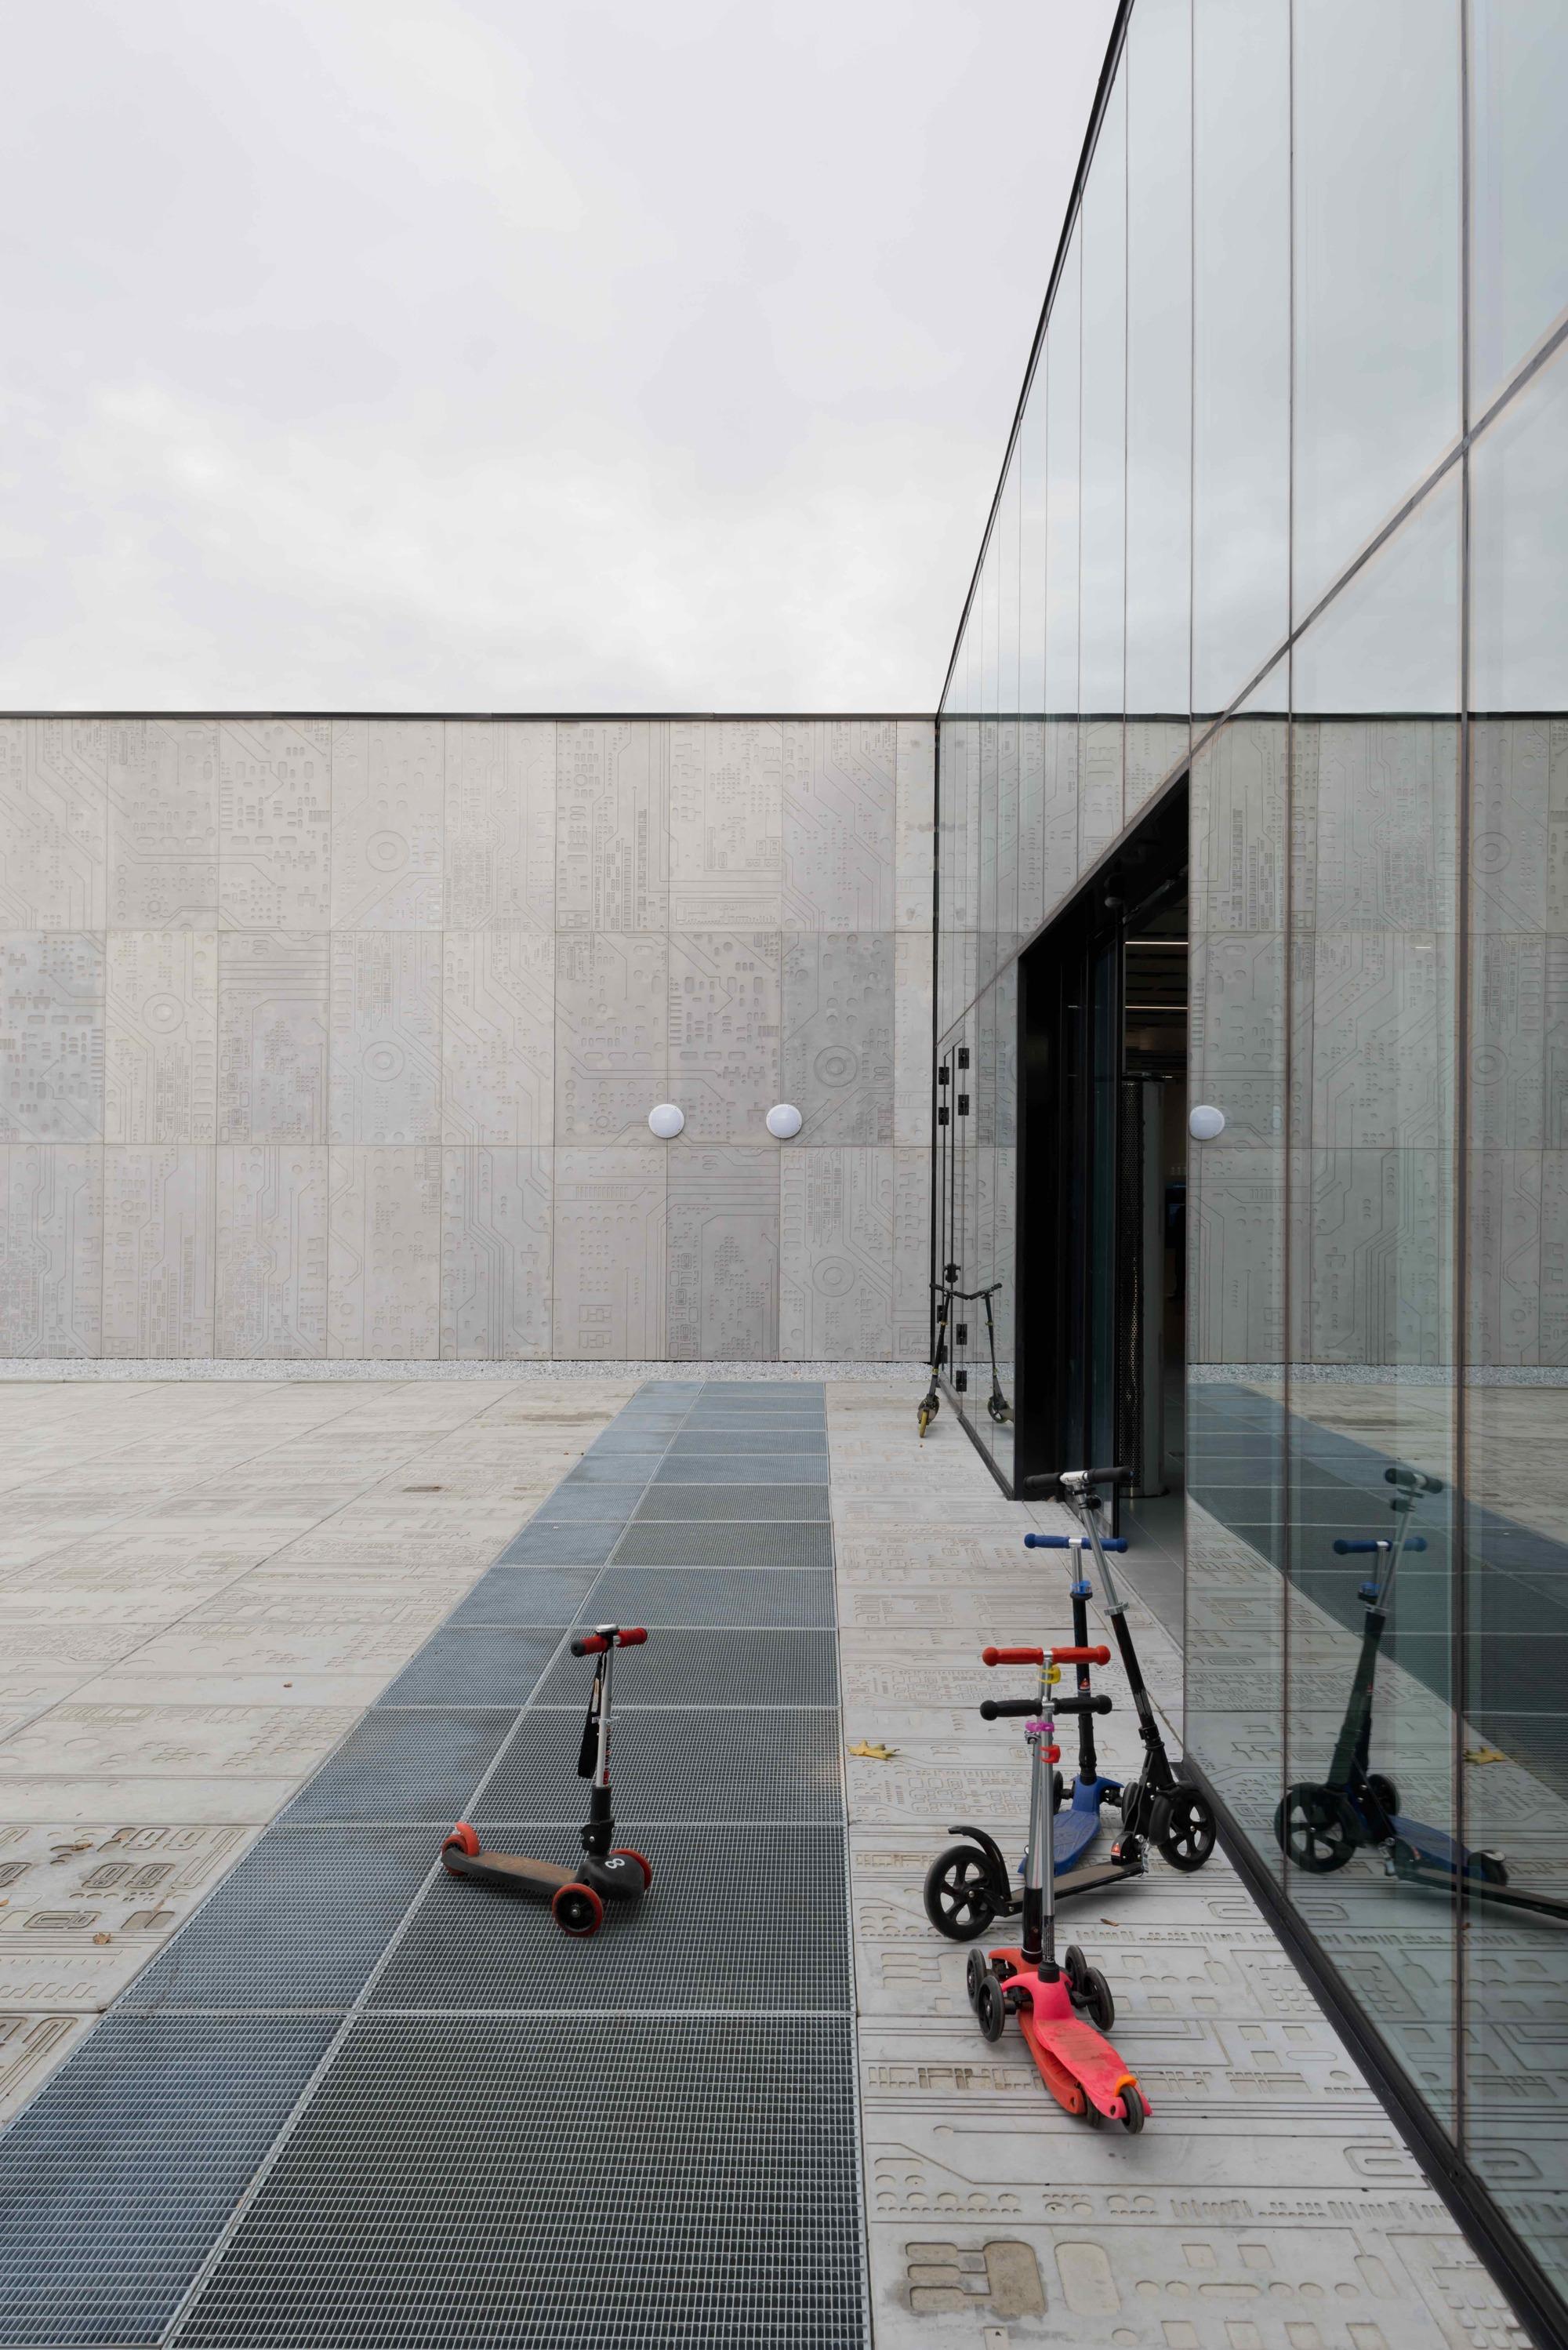 Best Image Pavilion DIT [Department of Information Technology] / Architecture bureau WALL